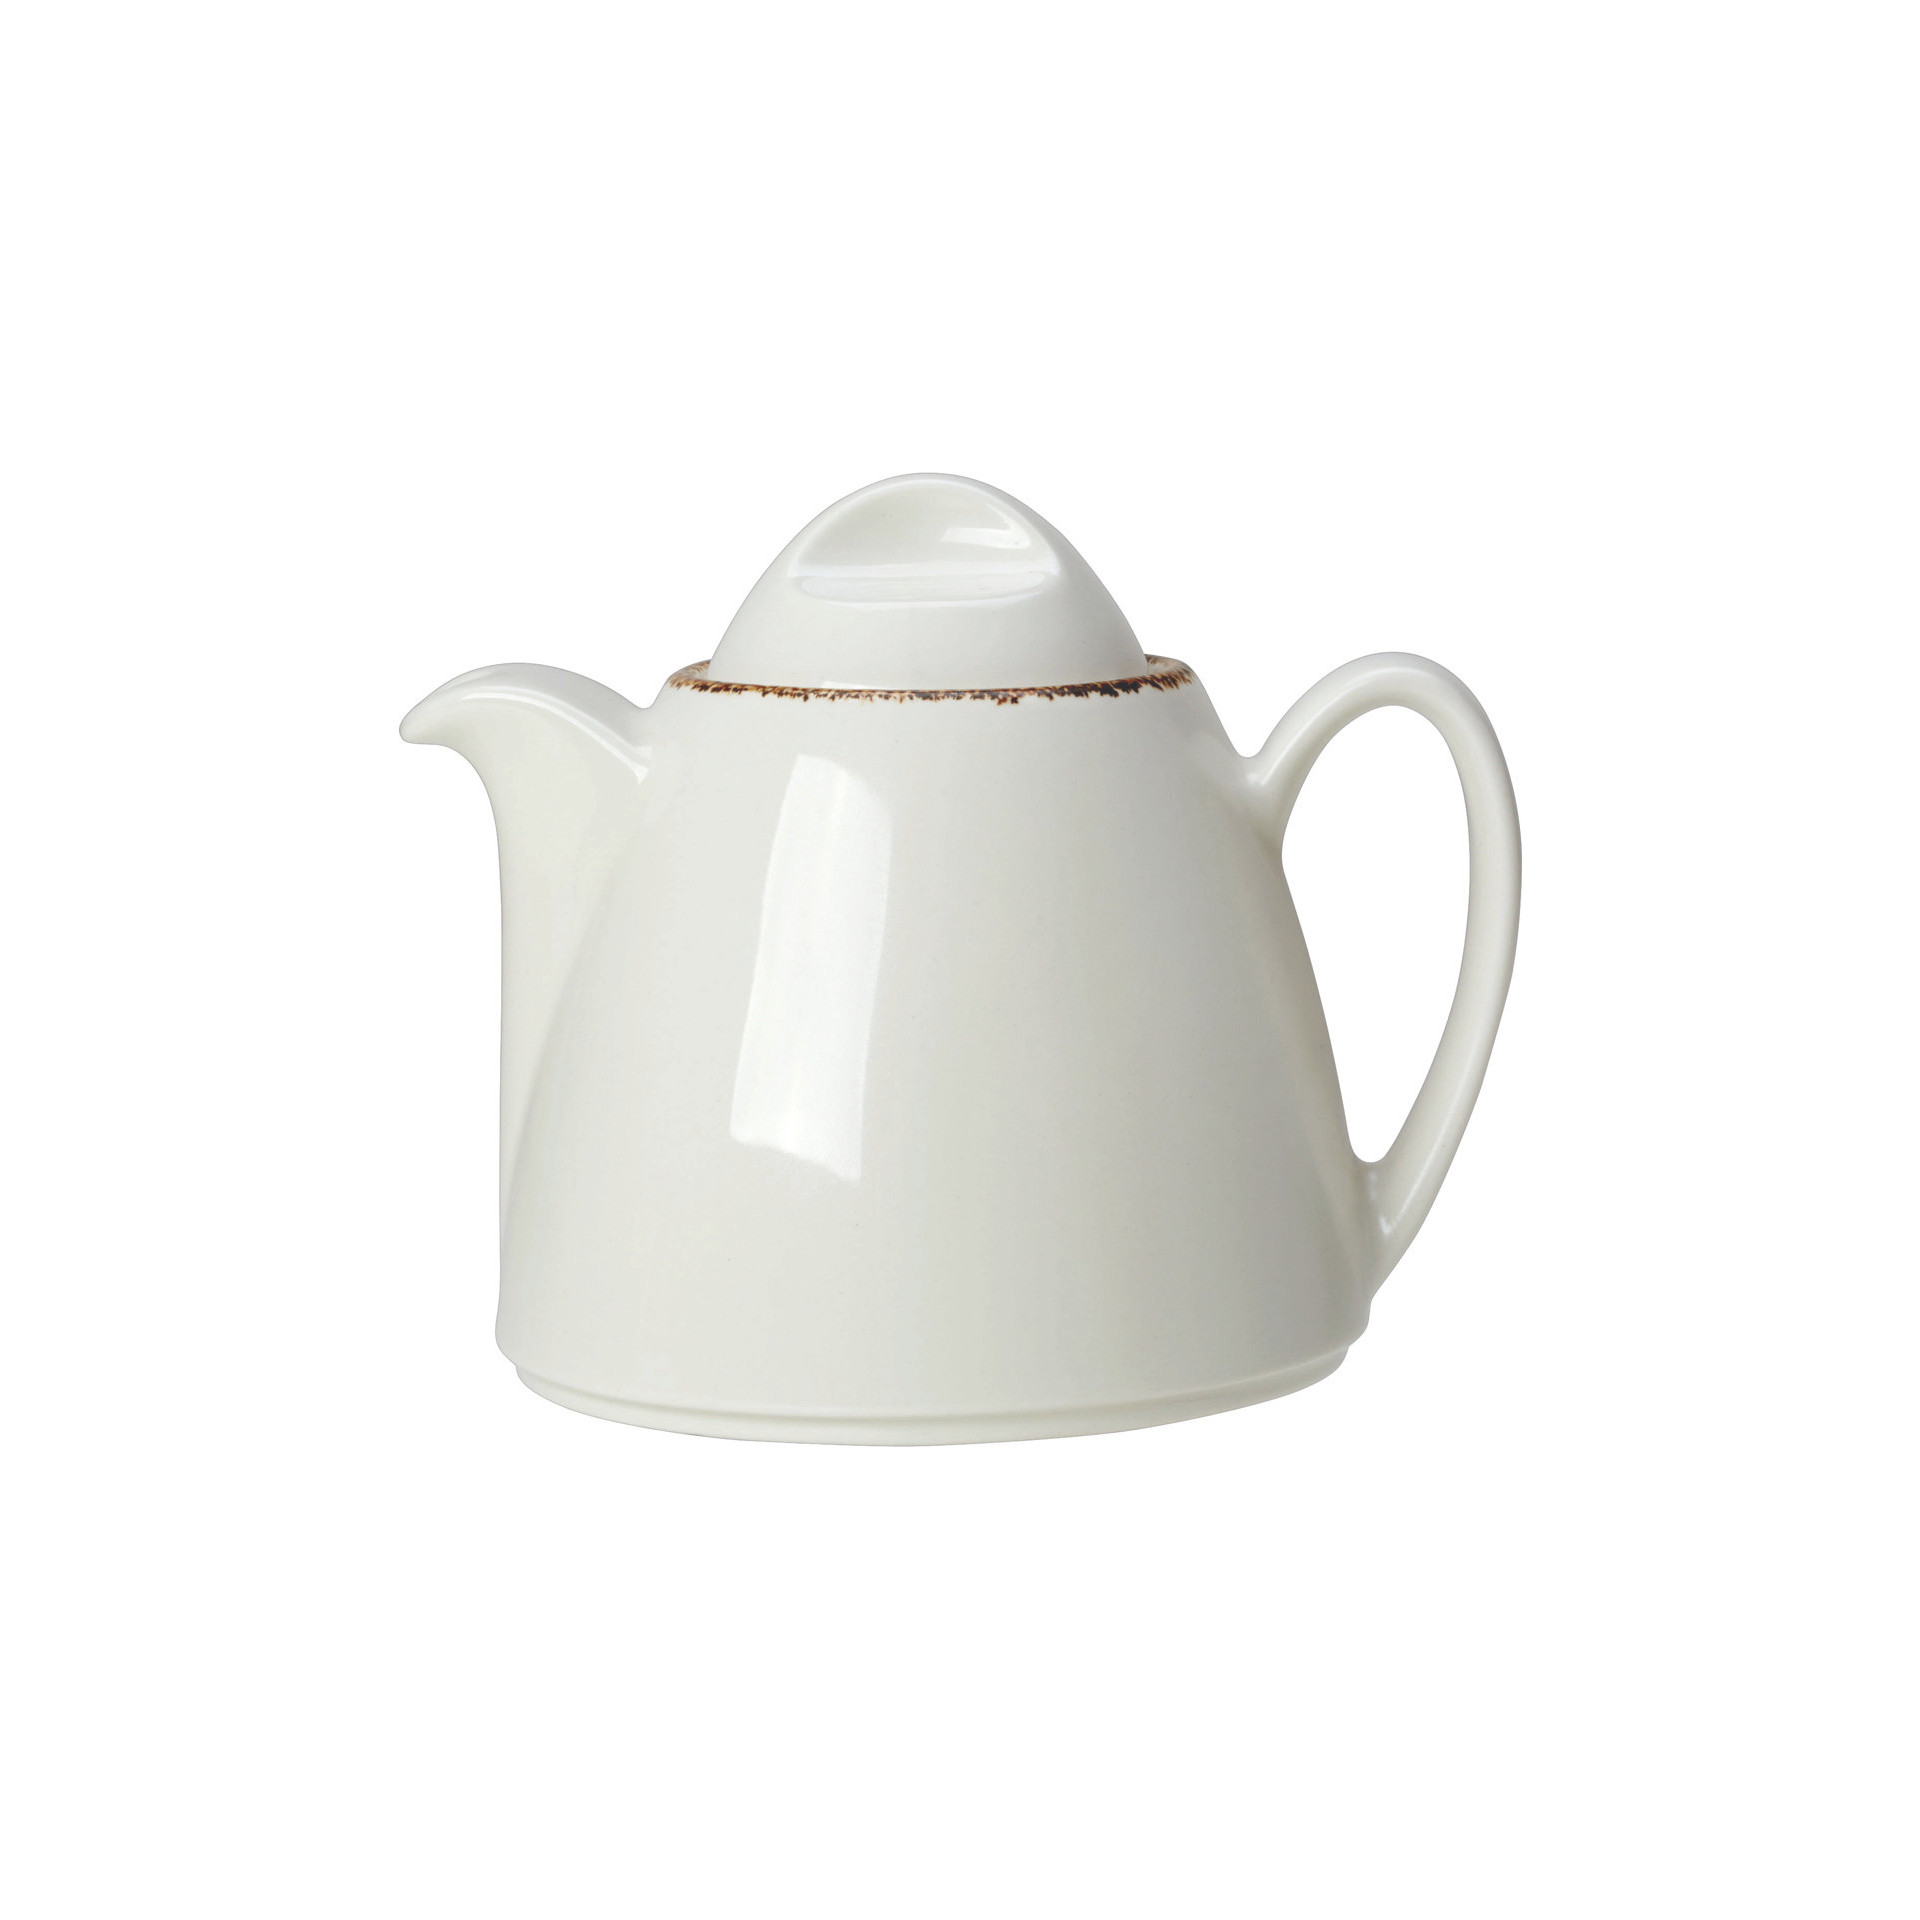 Brown Dapple, Tee- / Kaffeekanne 0,35 l